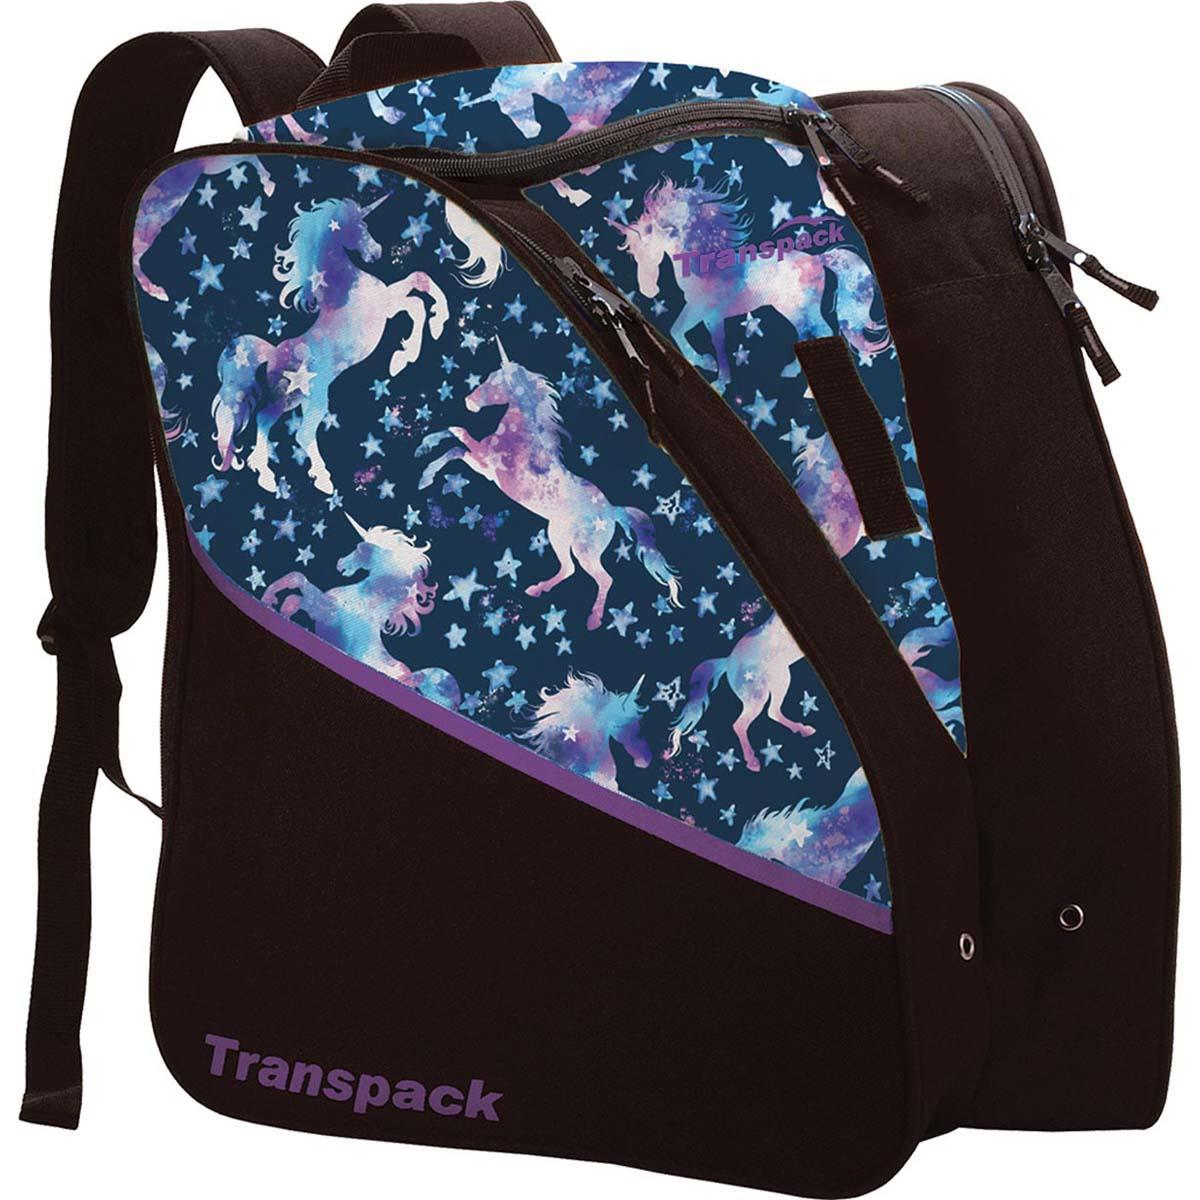 Trank Edge Ski Gear Bag Youth